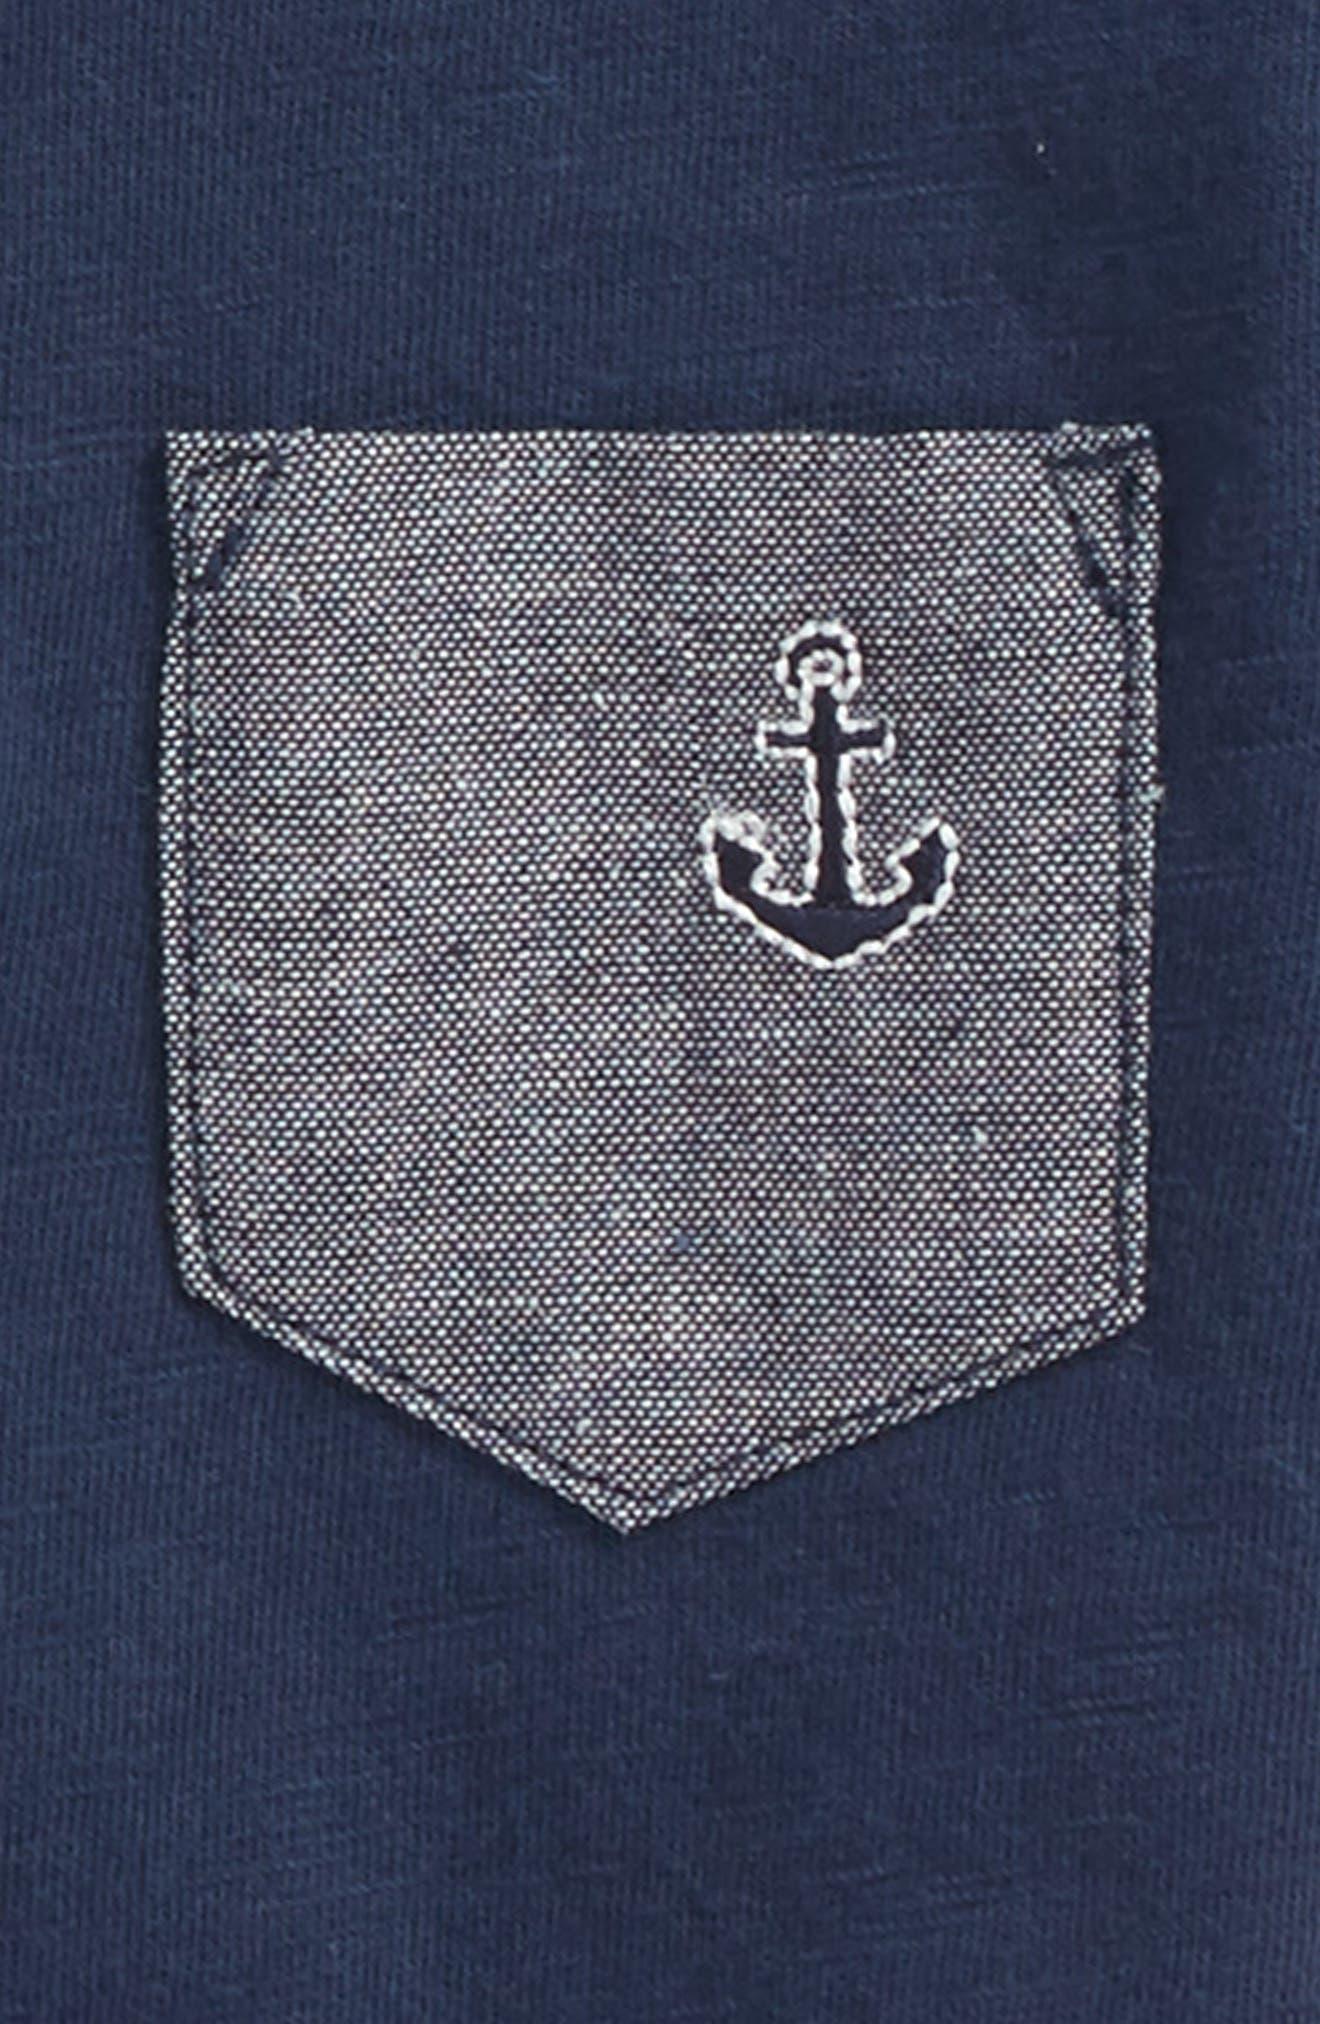 Goodlife T-Shirt,                             Alternate thumbnail 2, color,                             Navy